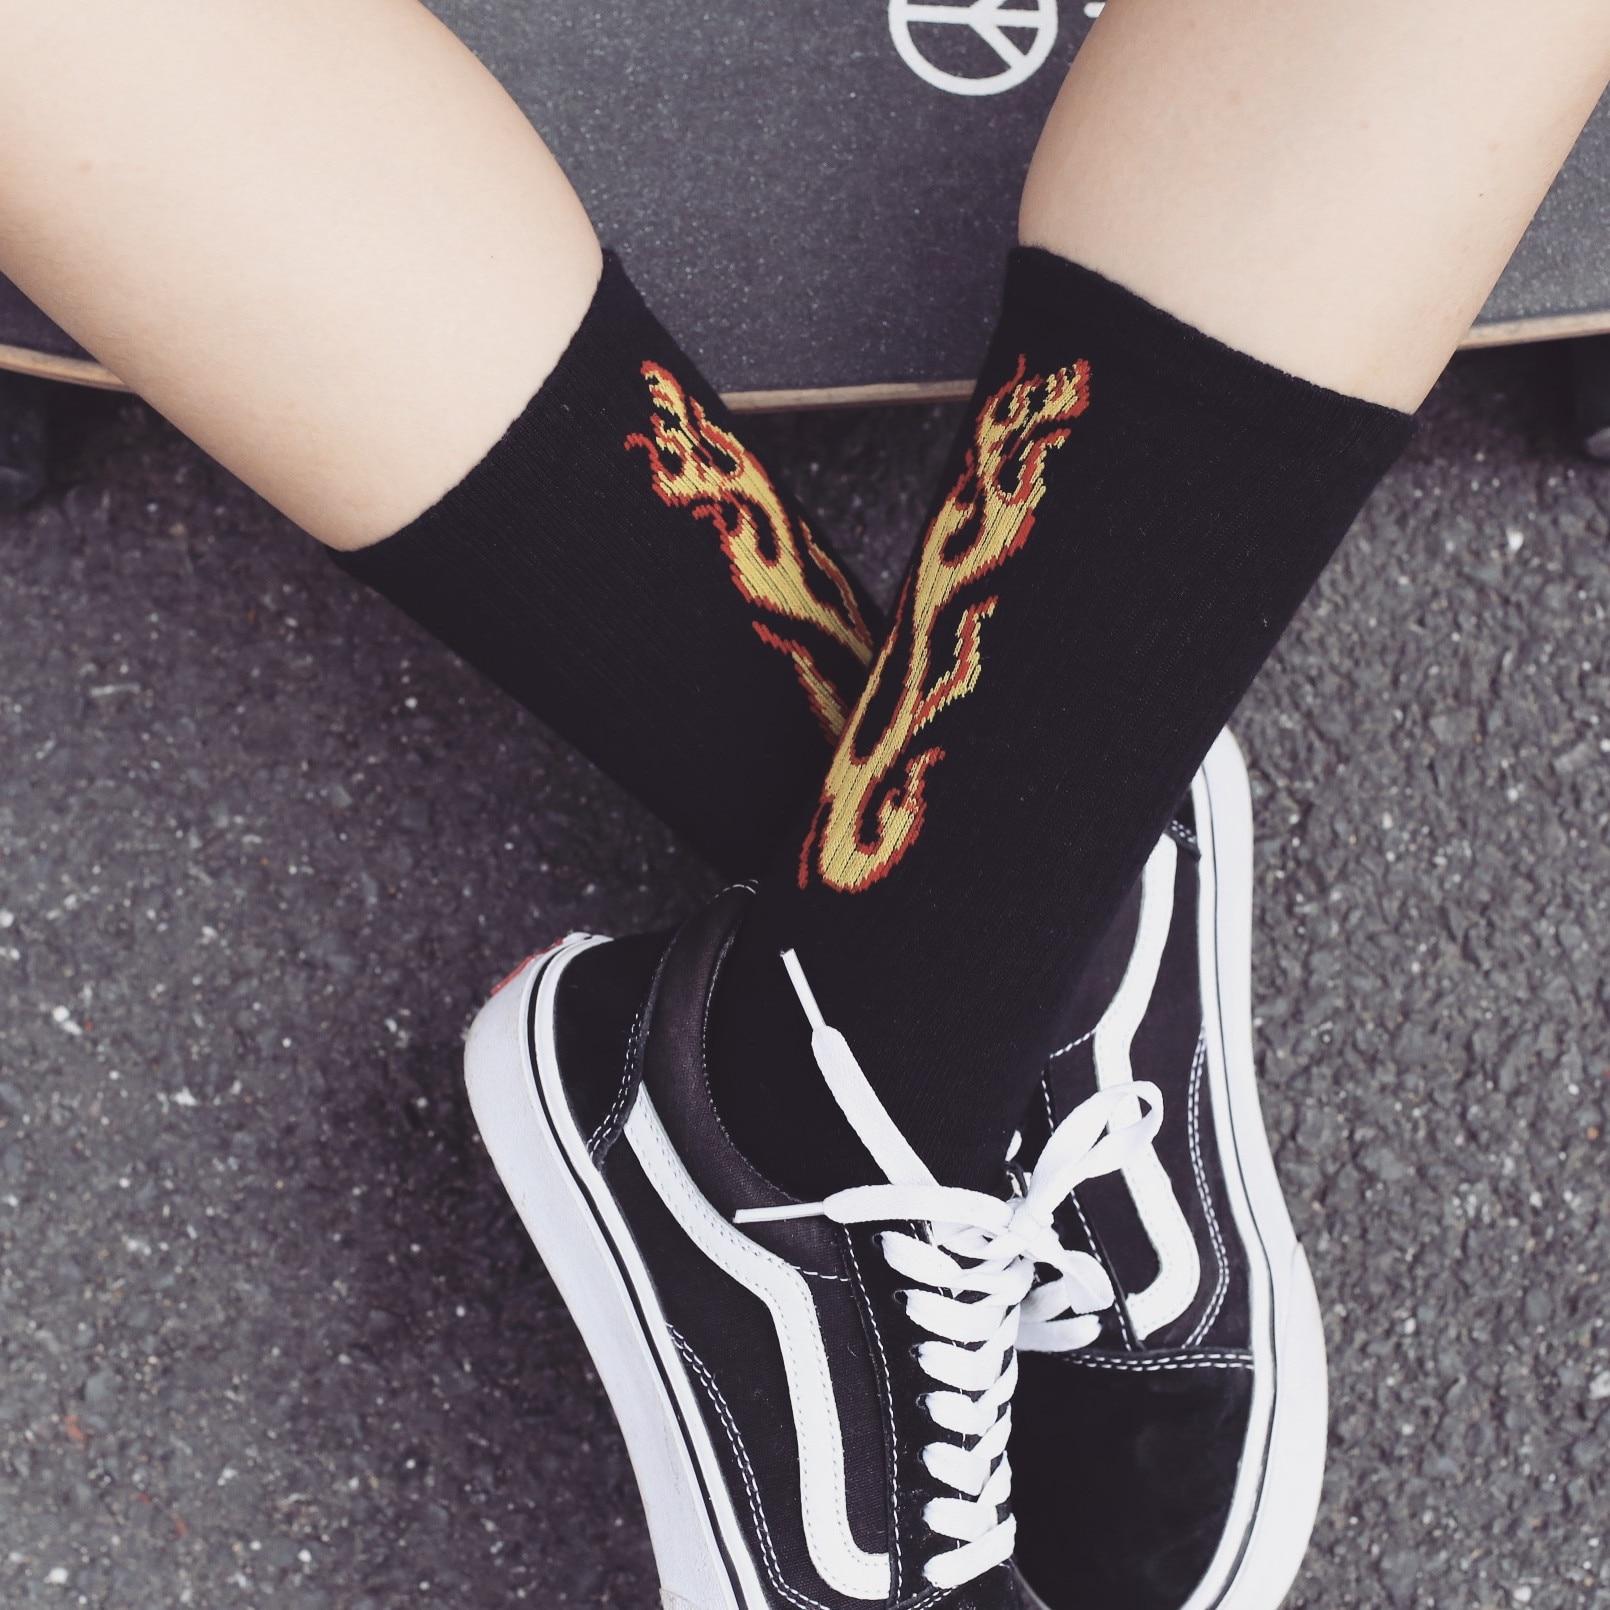 WJFXSOX 1 Pairs Original Flame Tide Brand Lovers Socks Harajuku Male Female Skateboard Hiphop Meias Unisex Flame Pattern Socks